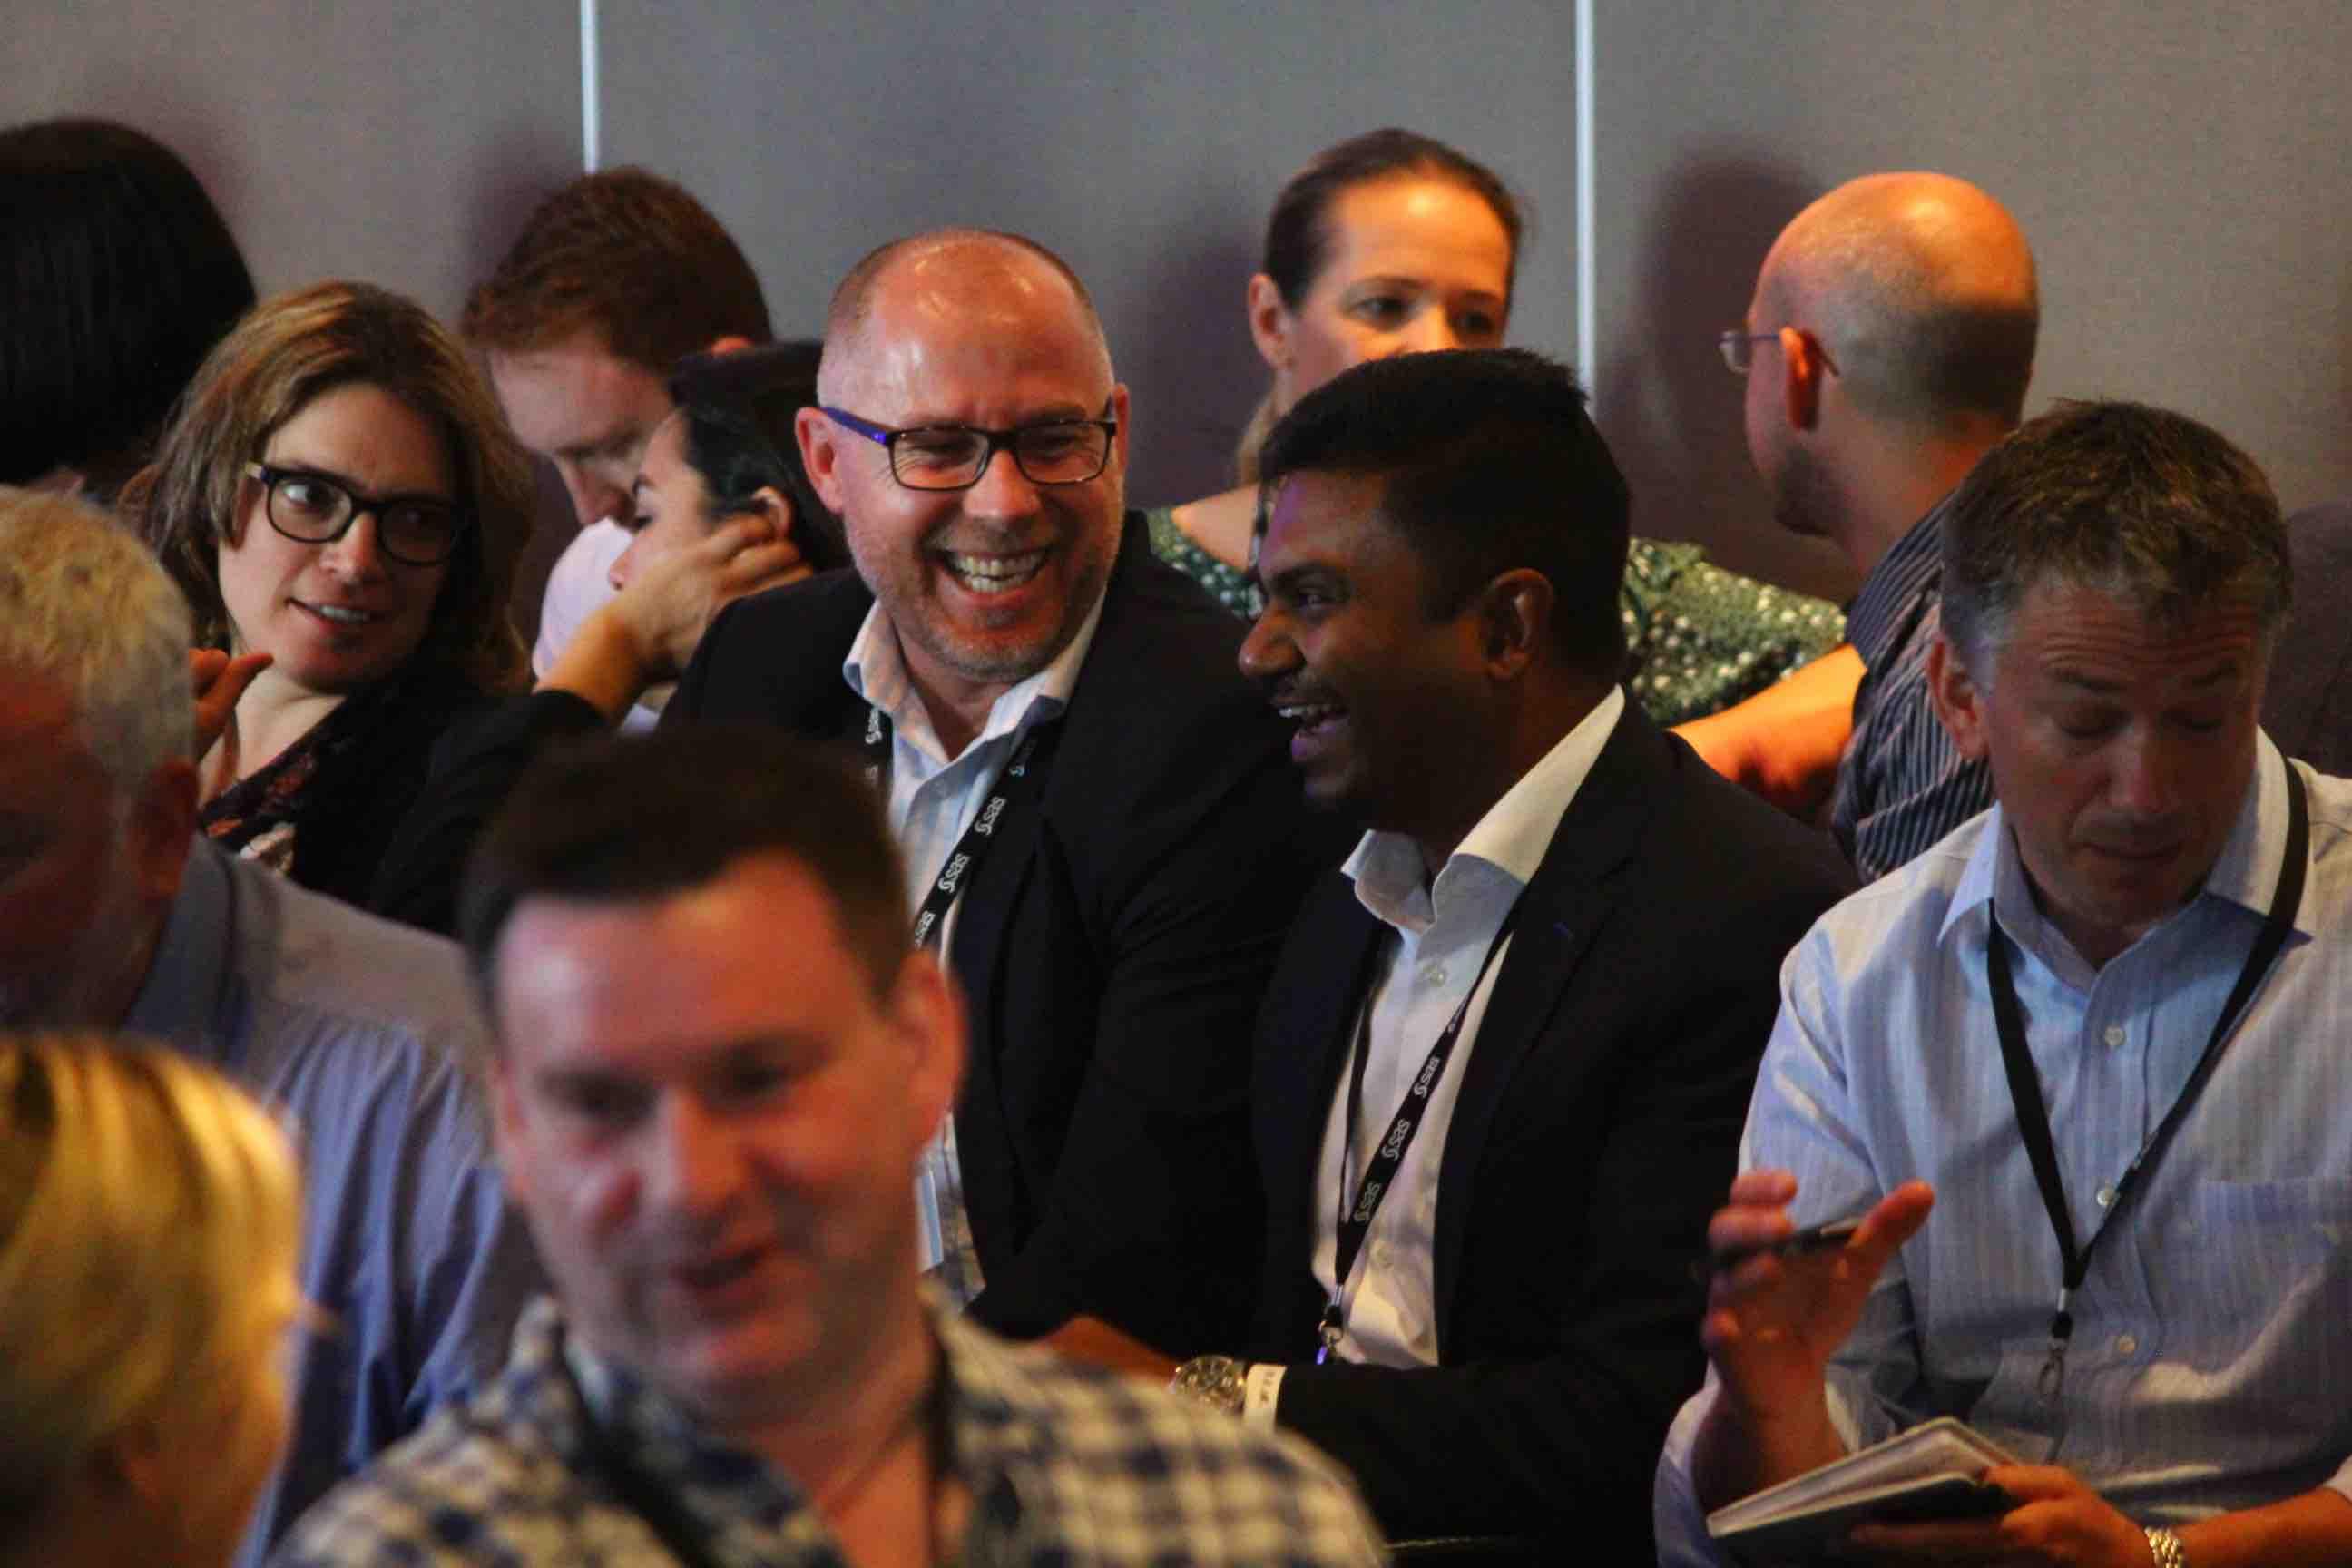 CDAO New Zealand Networking 9